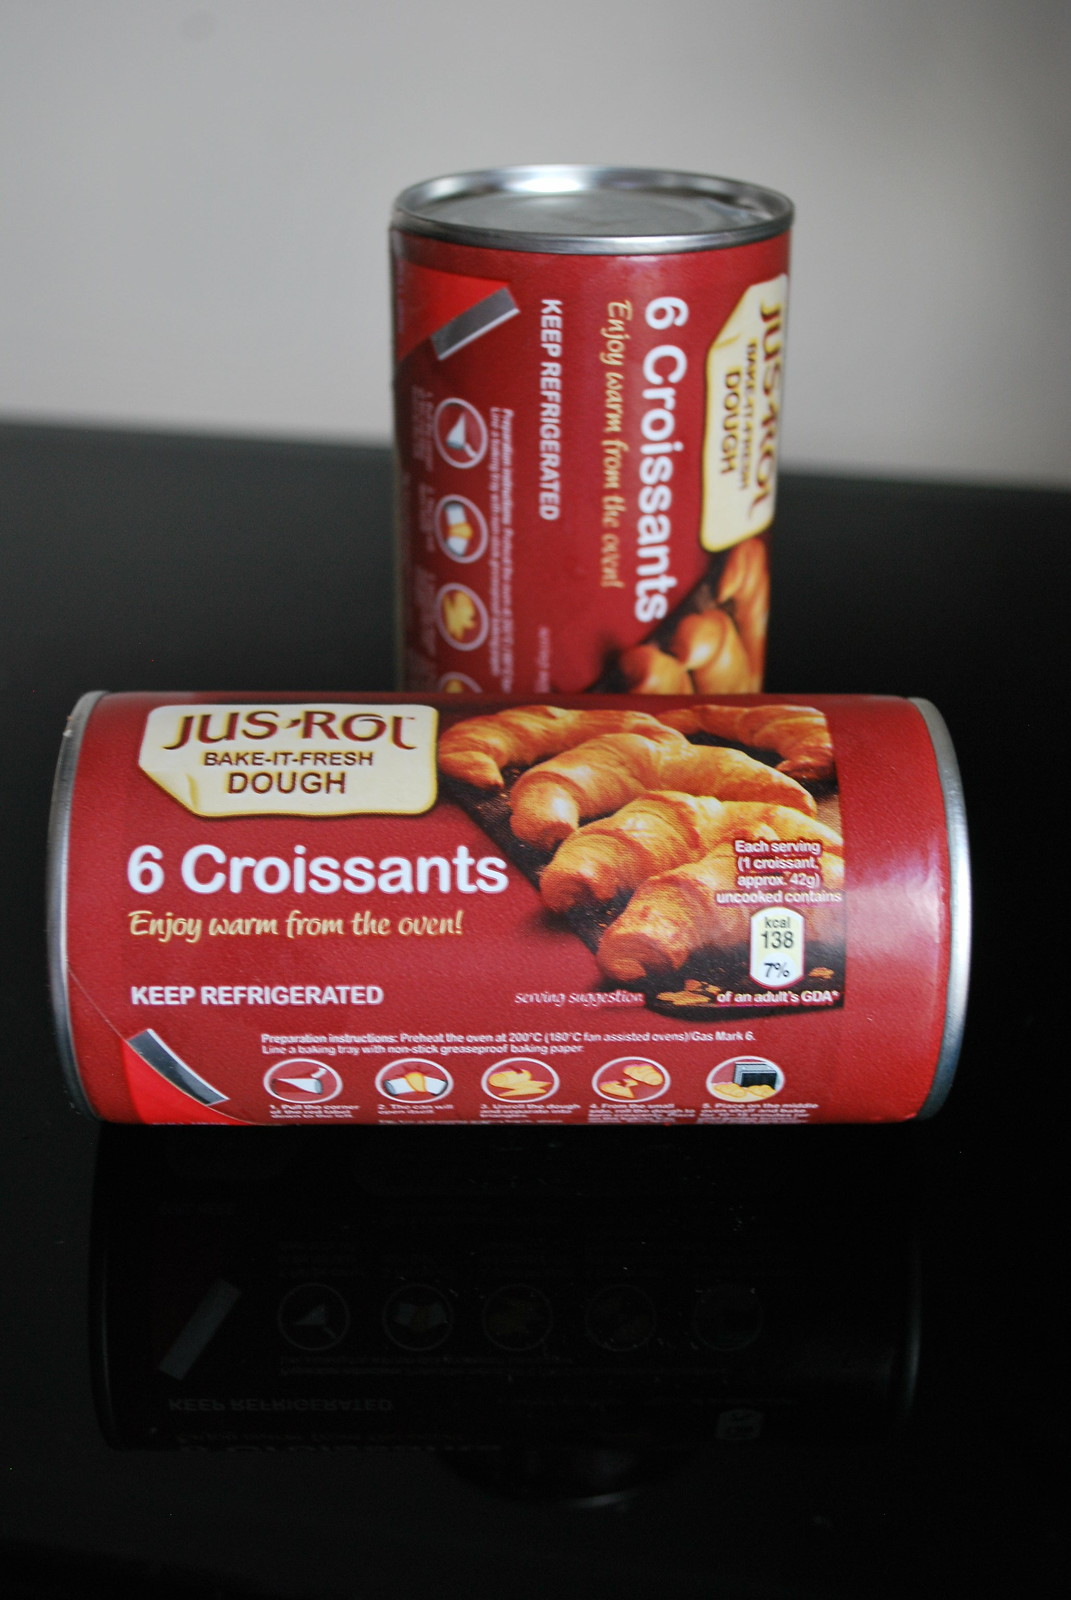 Jus Rol Croissants Recipes Jus-rol Croissants